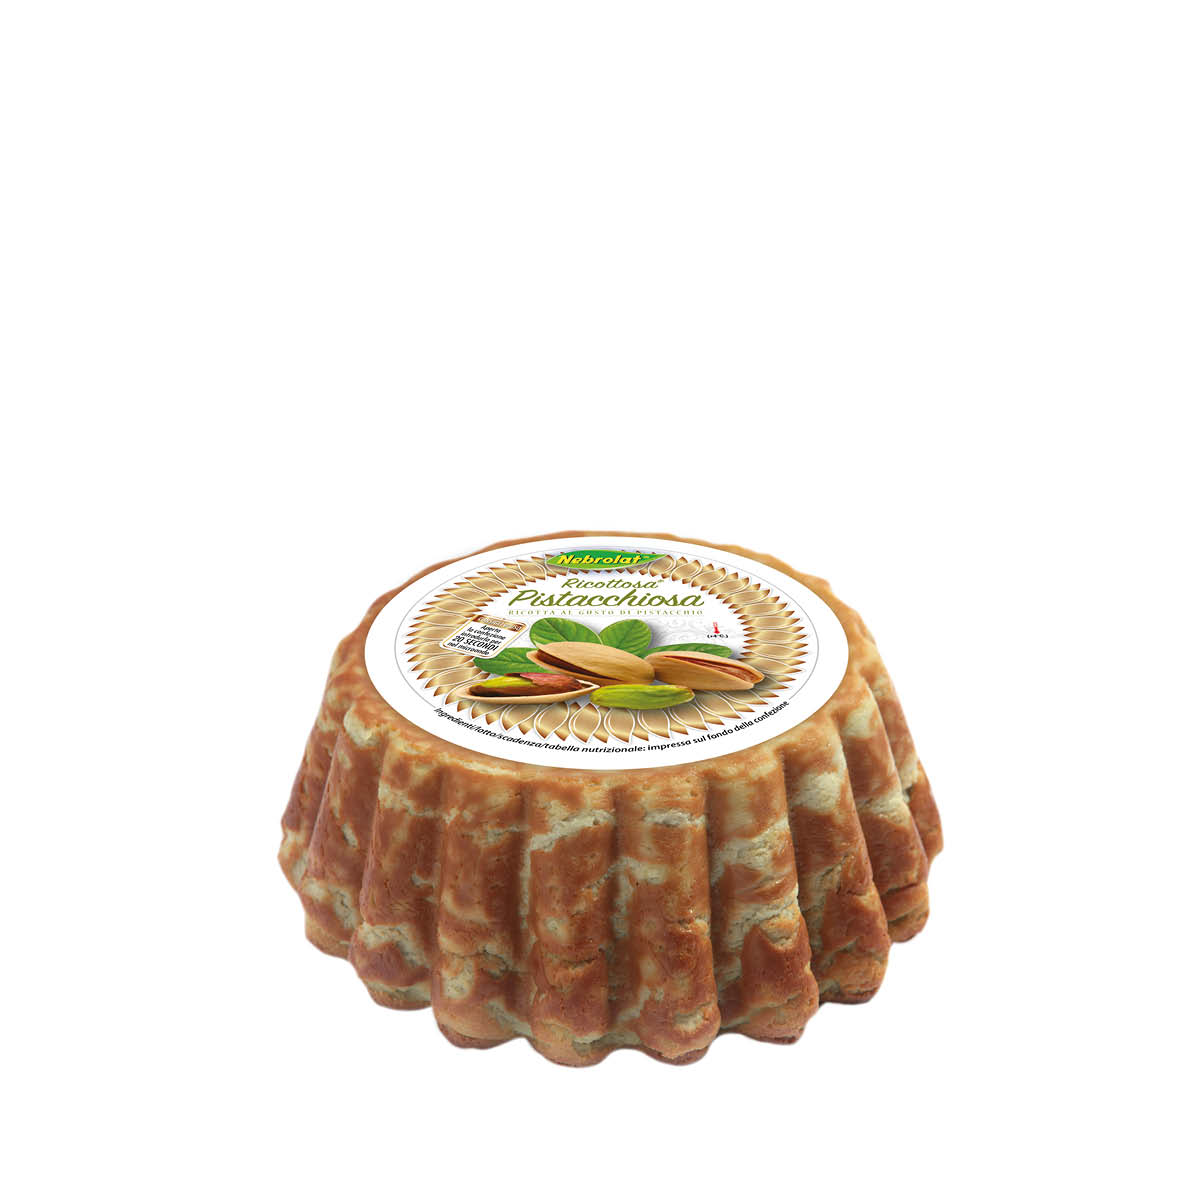 Ricottosa pistacchiosa